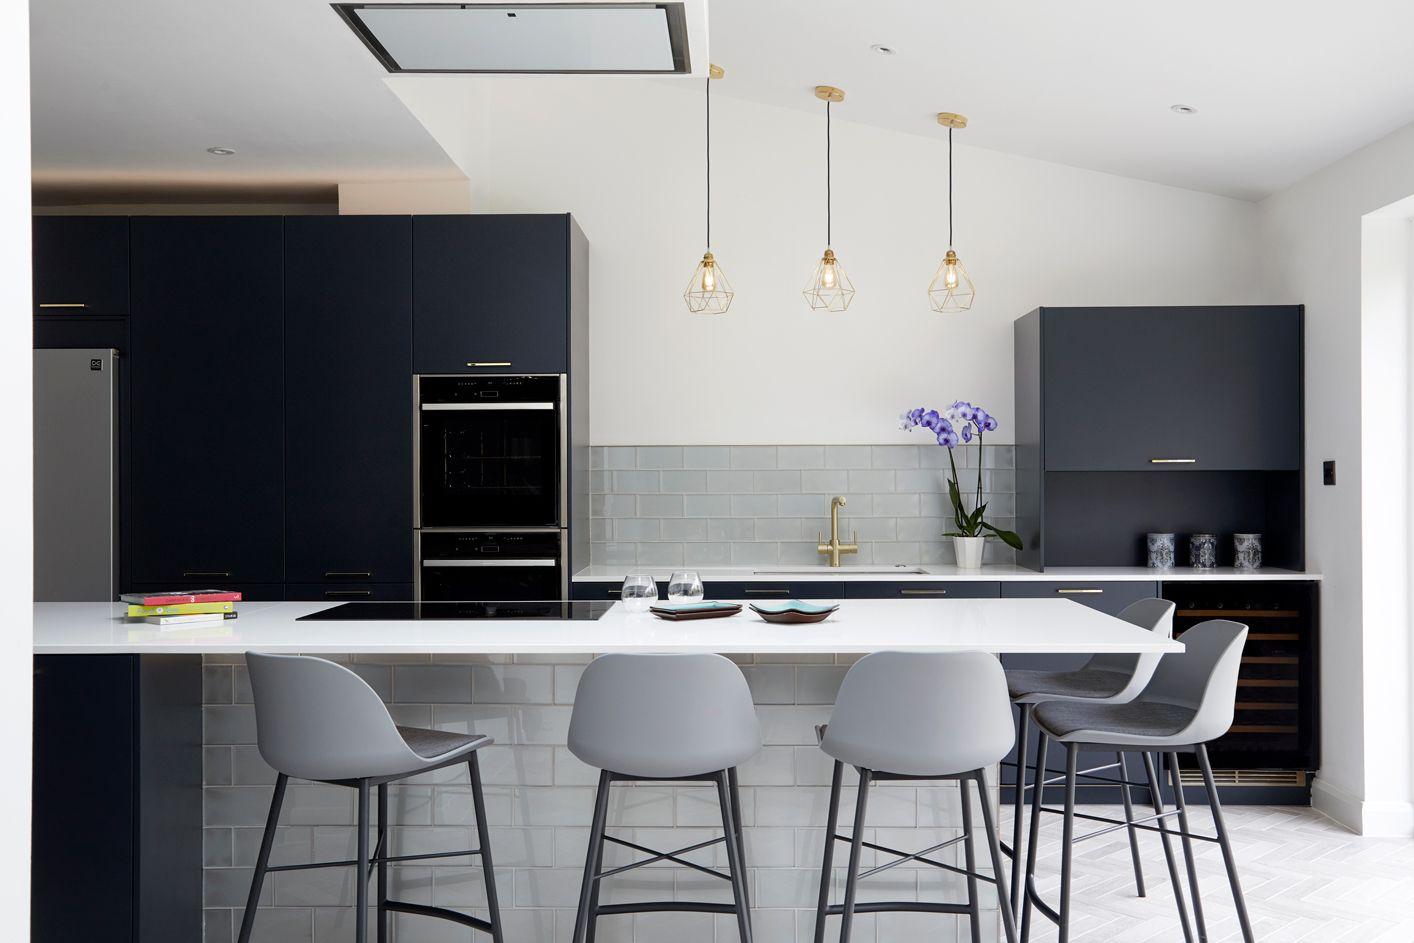 Interior Designer Monita Cheung Worked With Designspace London To